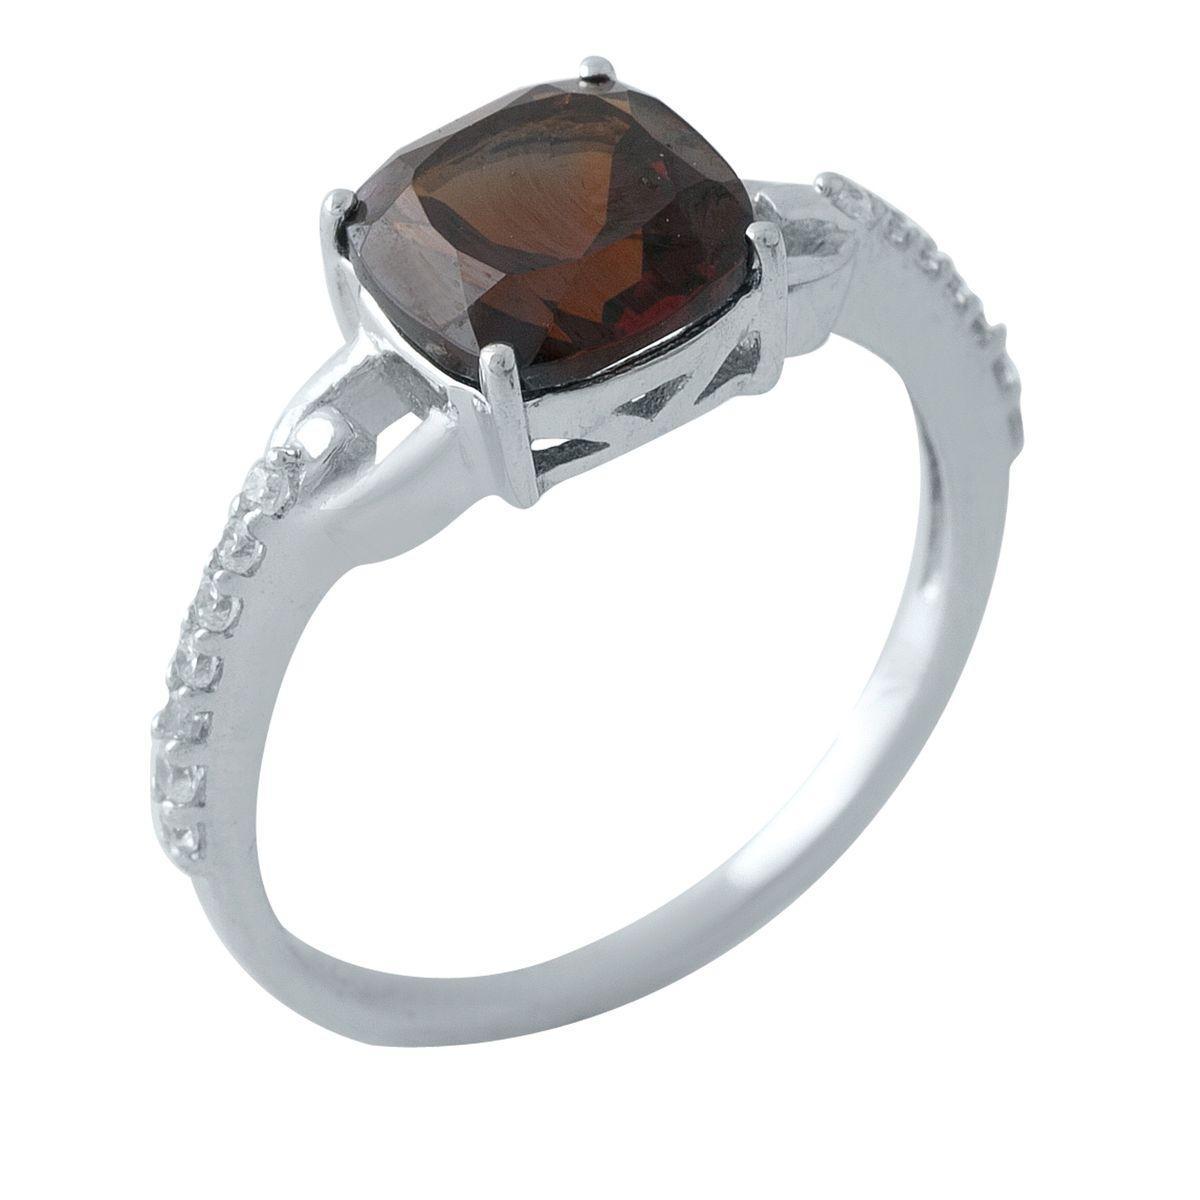 Серебряное кольцо DreamJewelry с натуральным гранатом (1970461) 17 размер